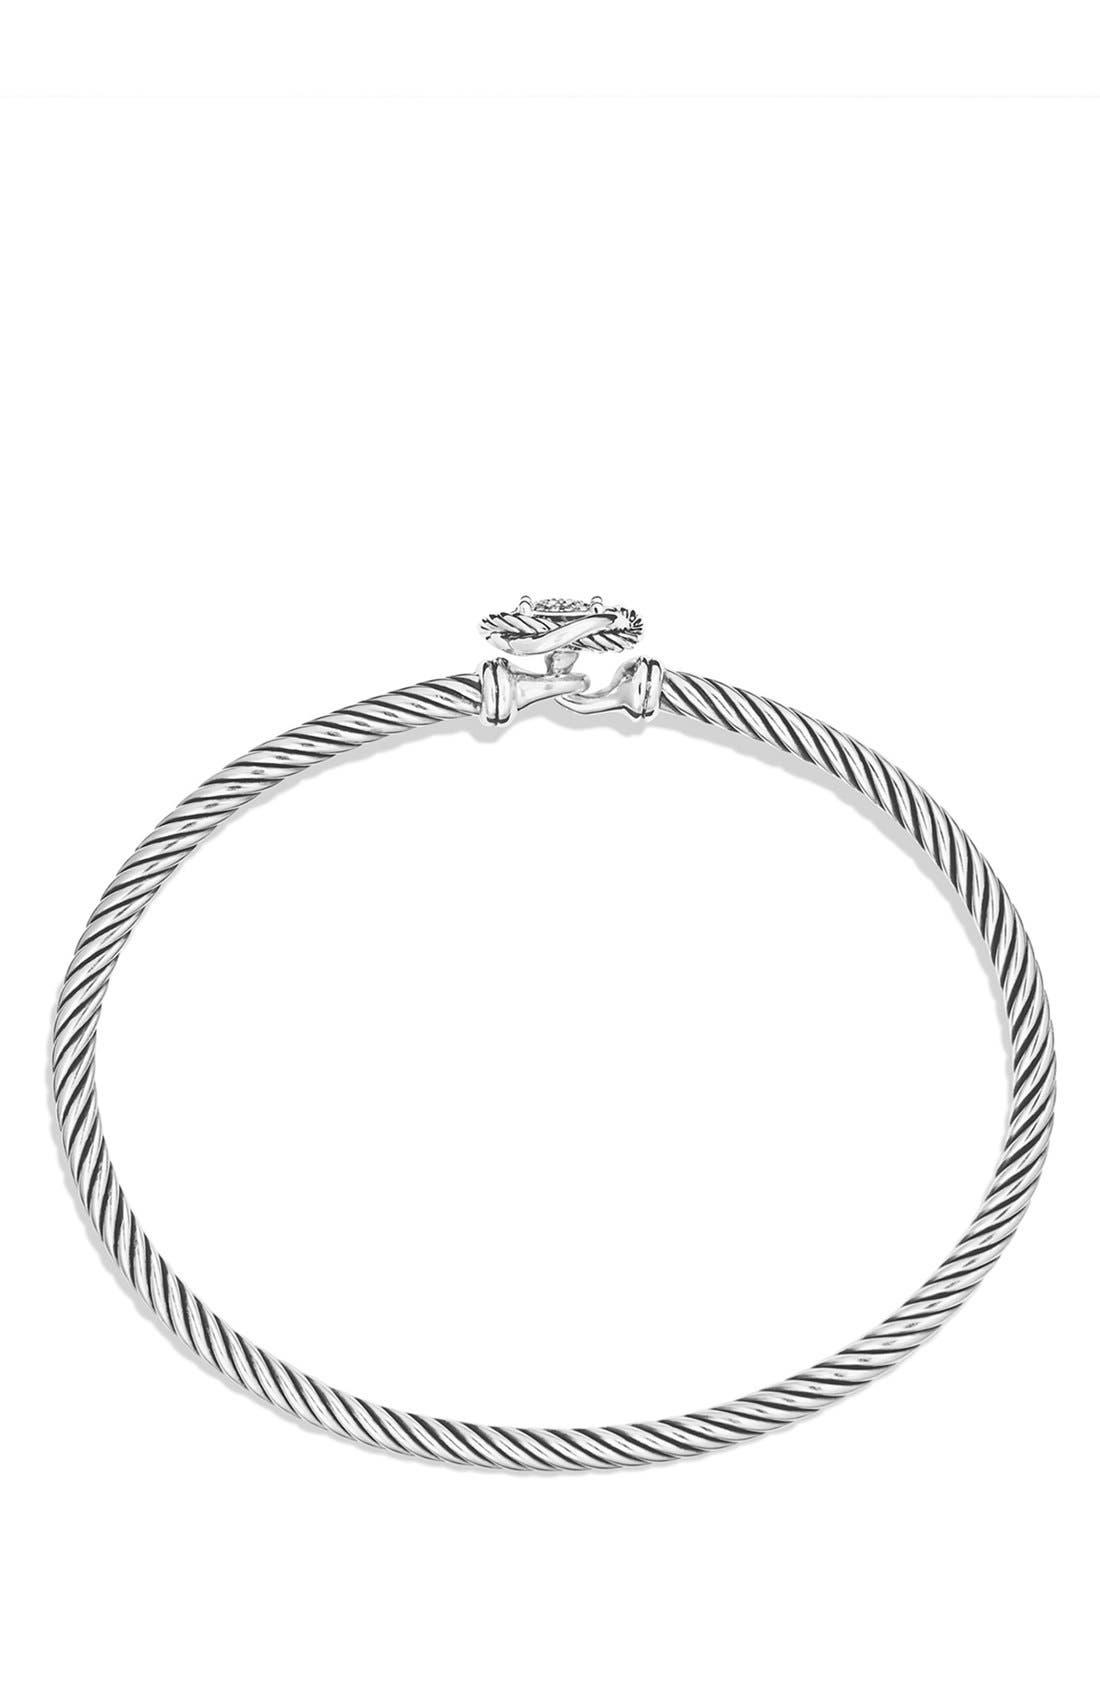 'Infinity' Bracelet with Diamonds,                             Alternate thumbnail 2, color,                             DIAMOND